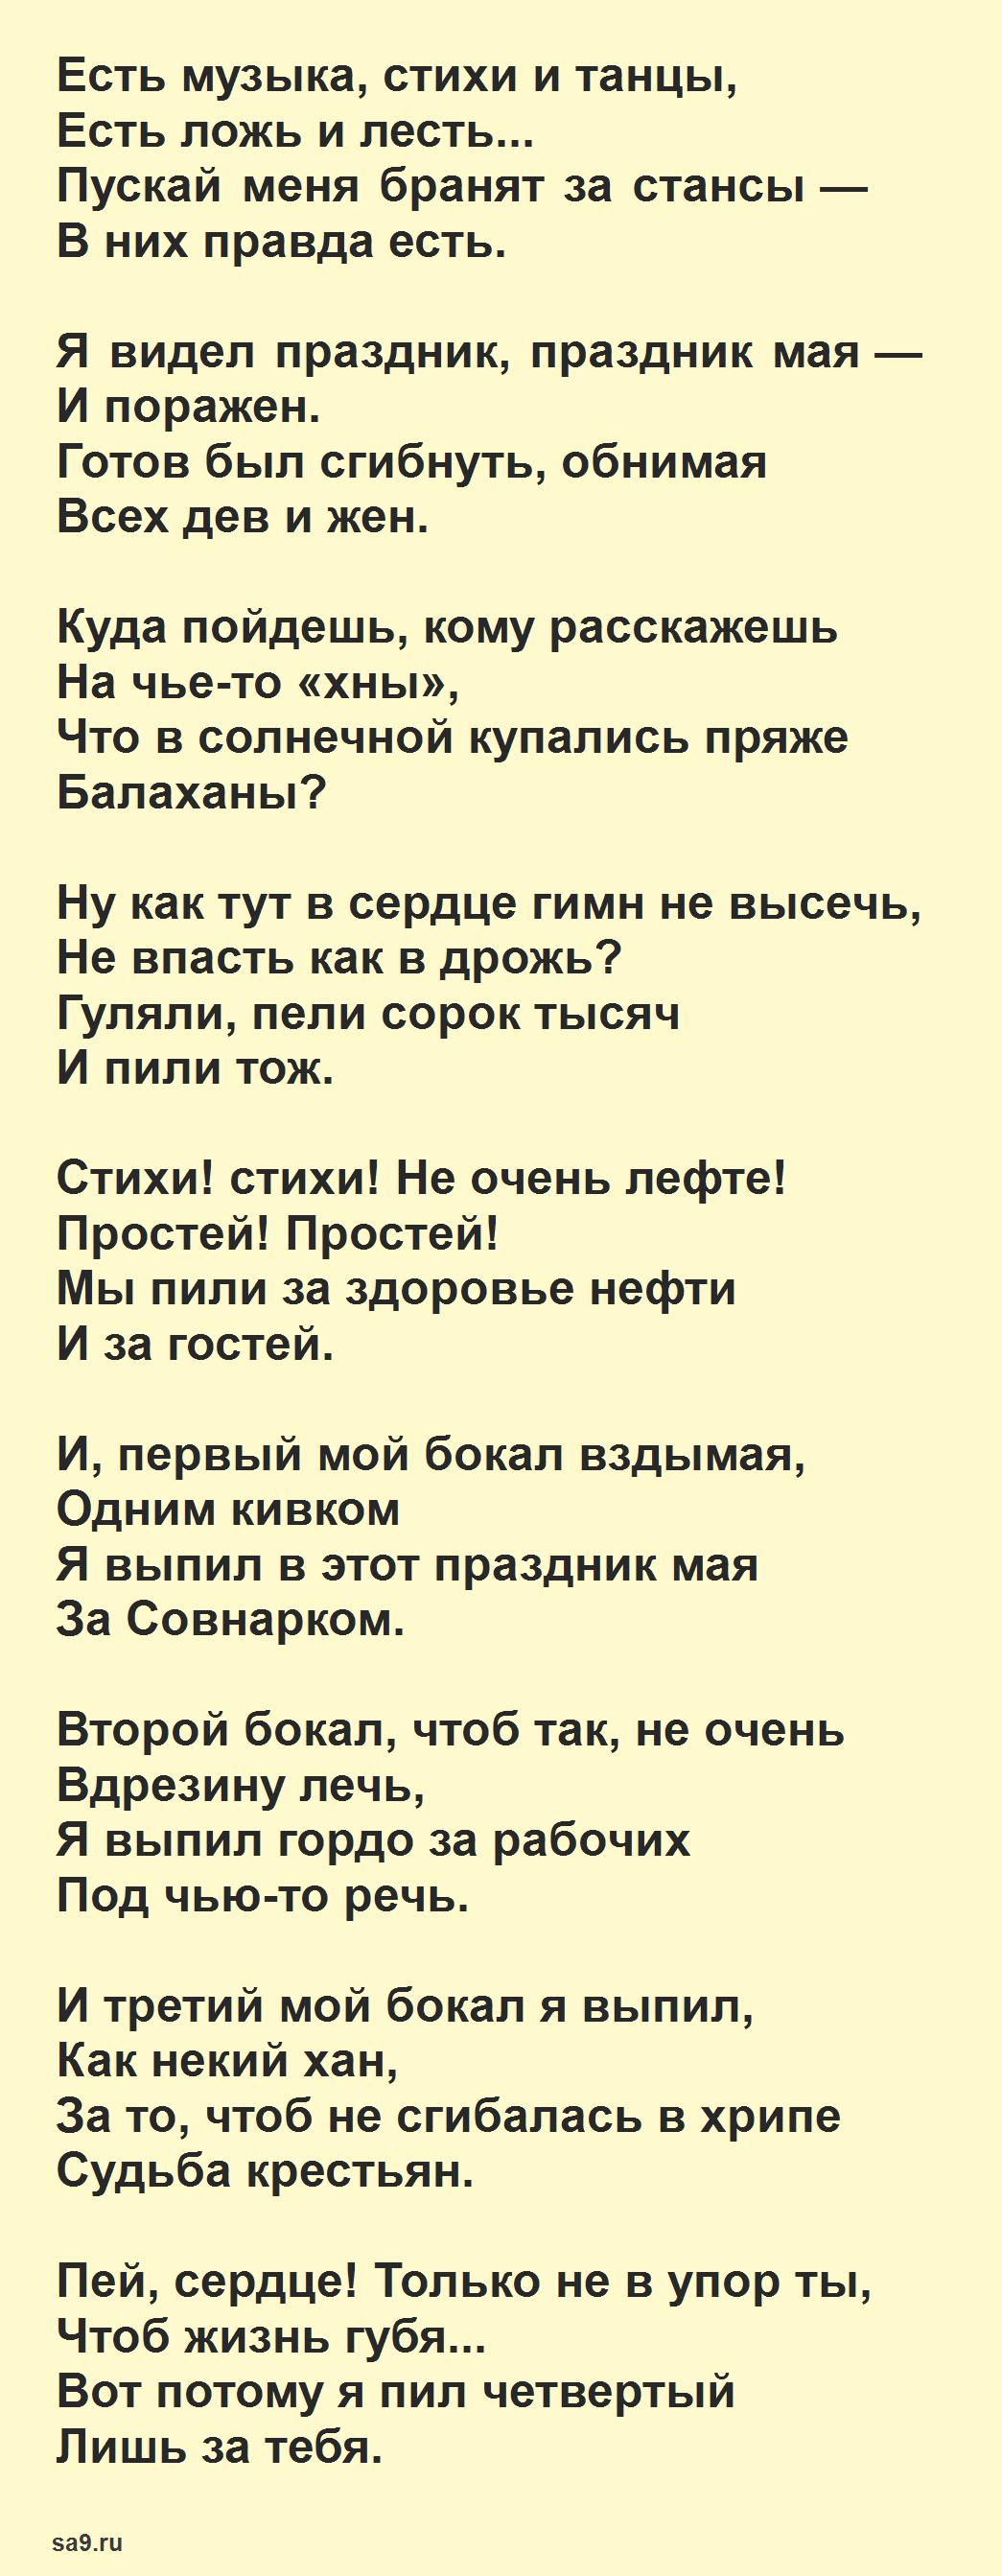 Стихи Есенина - 1 мая